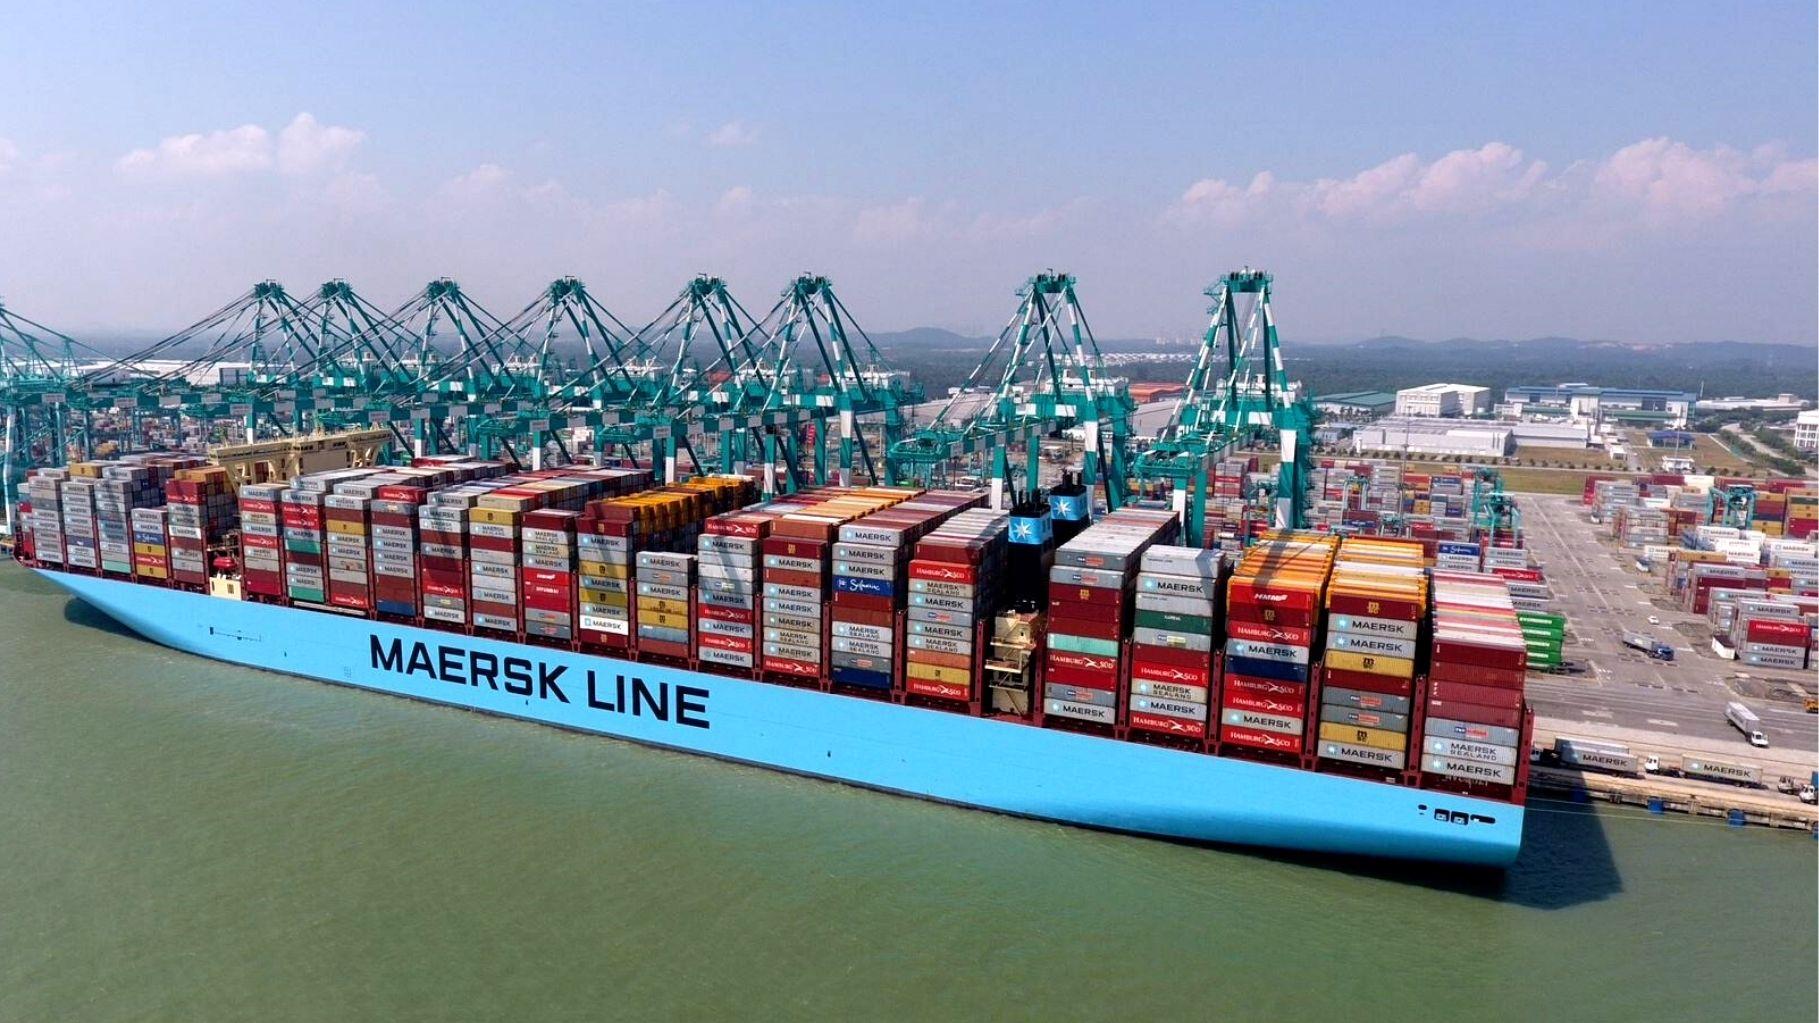 Maersk investe em start-up de combustíveis sustentáveis